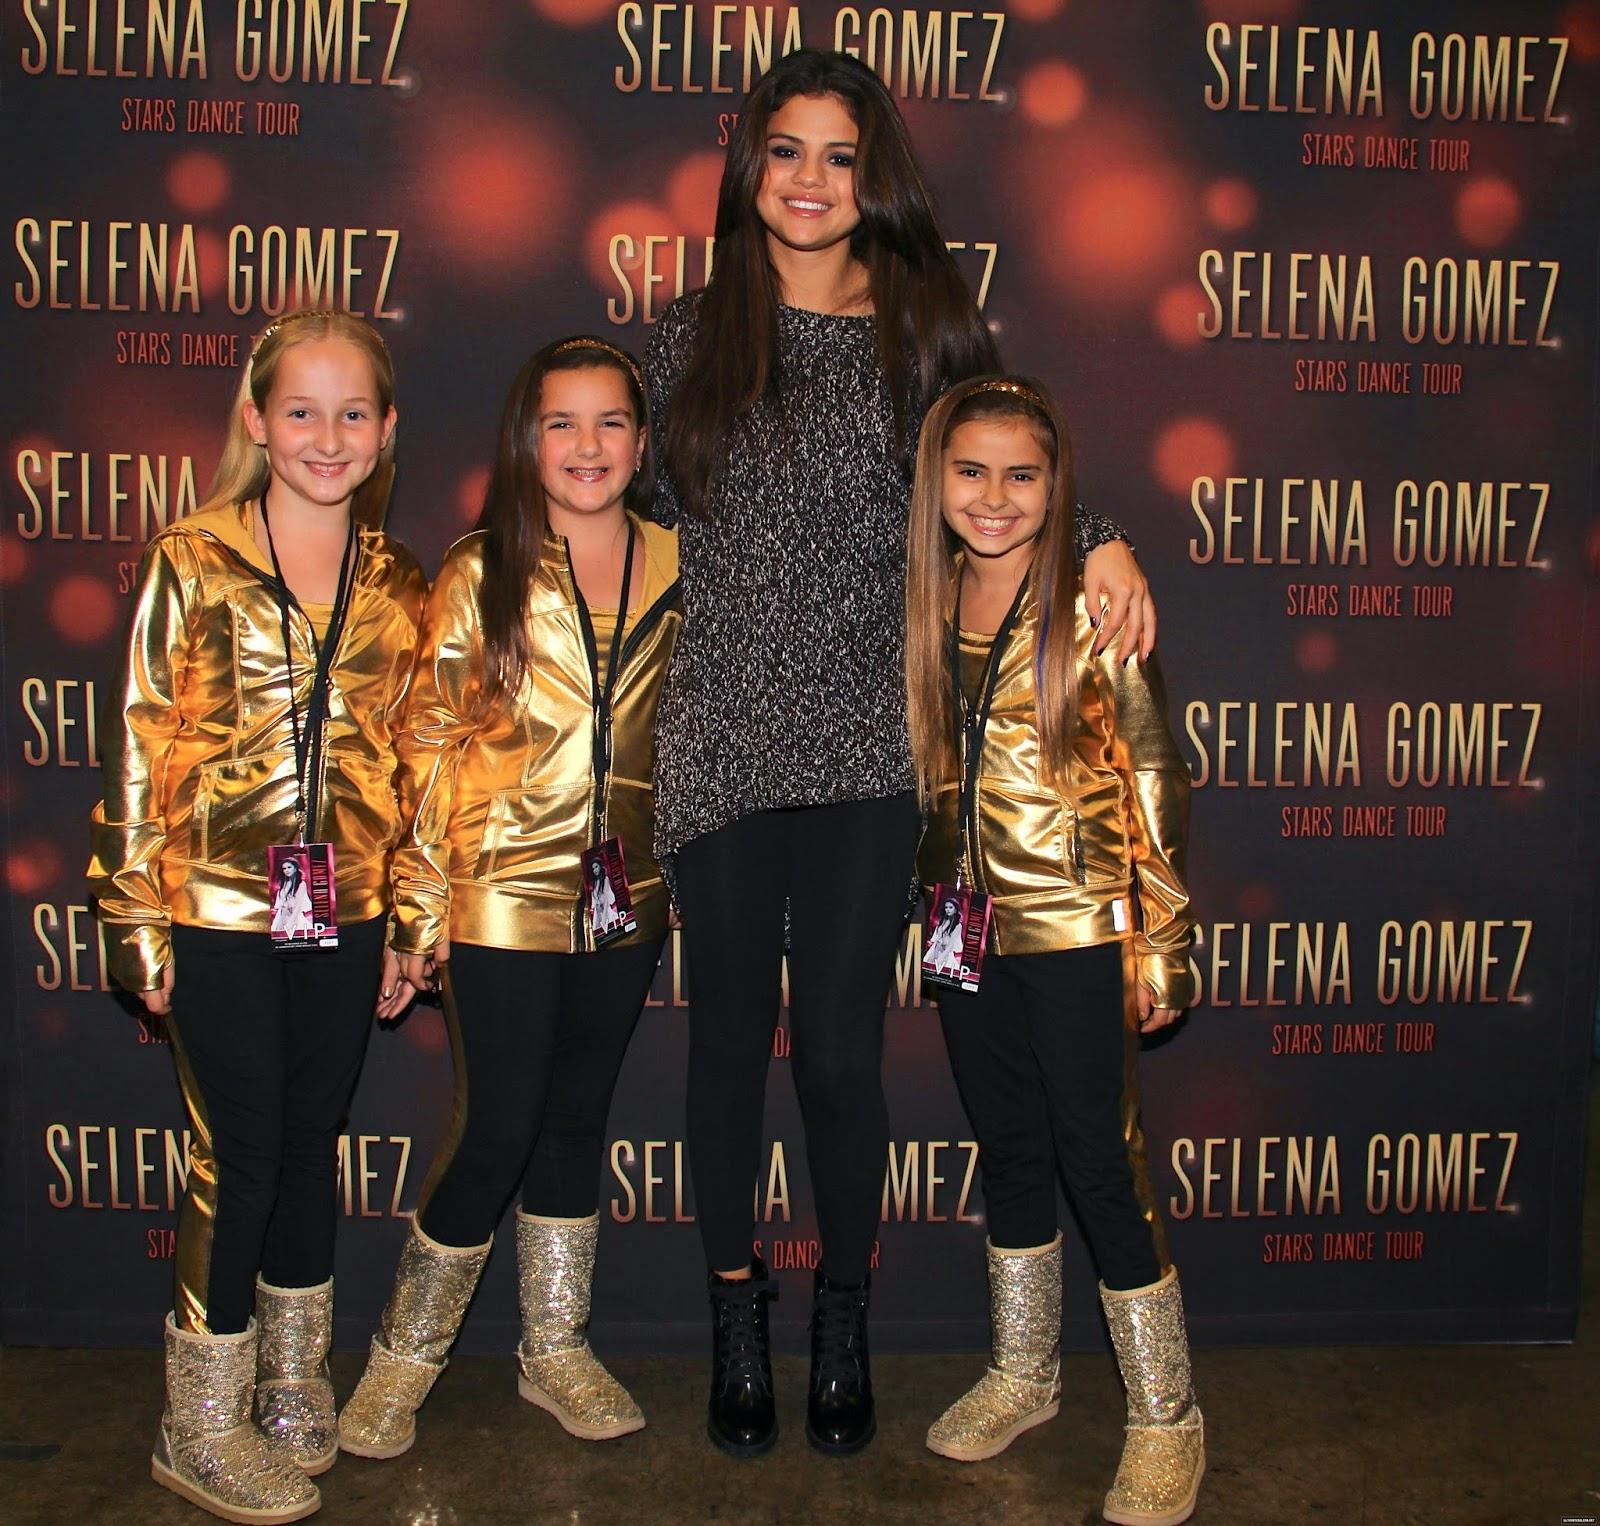 meet and greet selena gomez stars dance photo